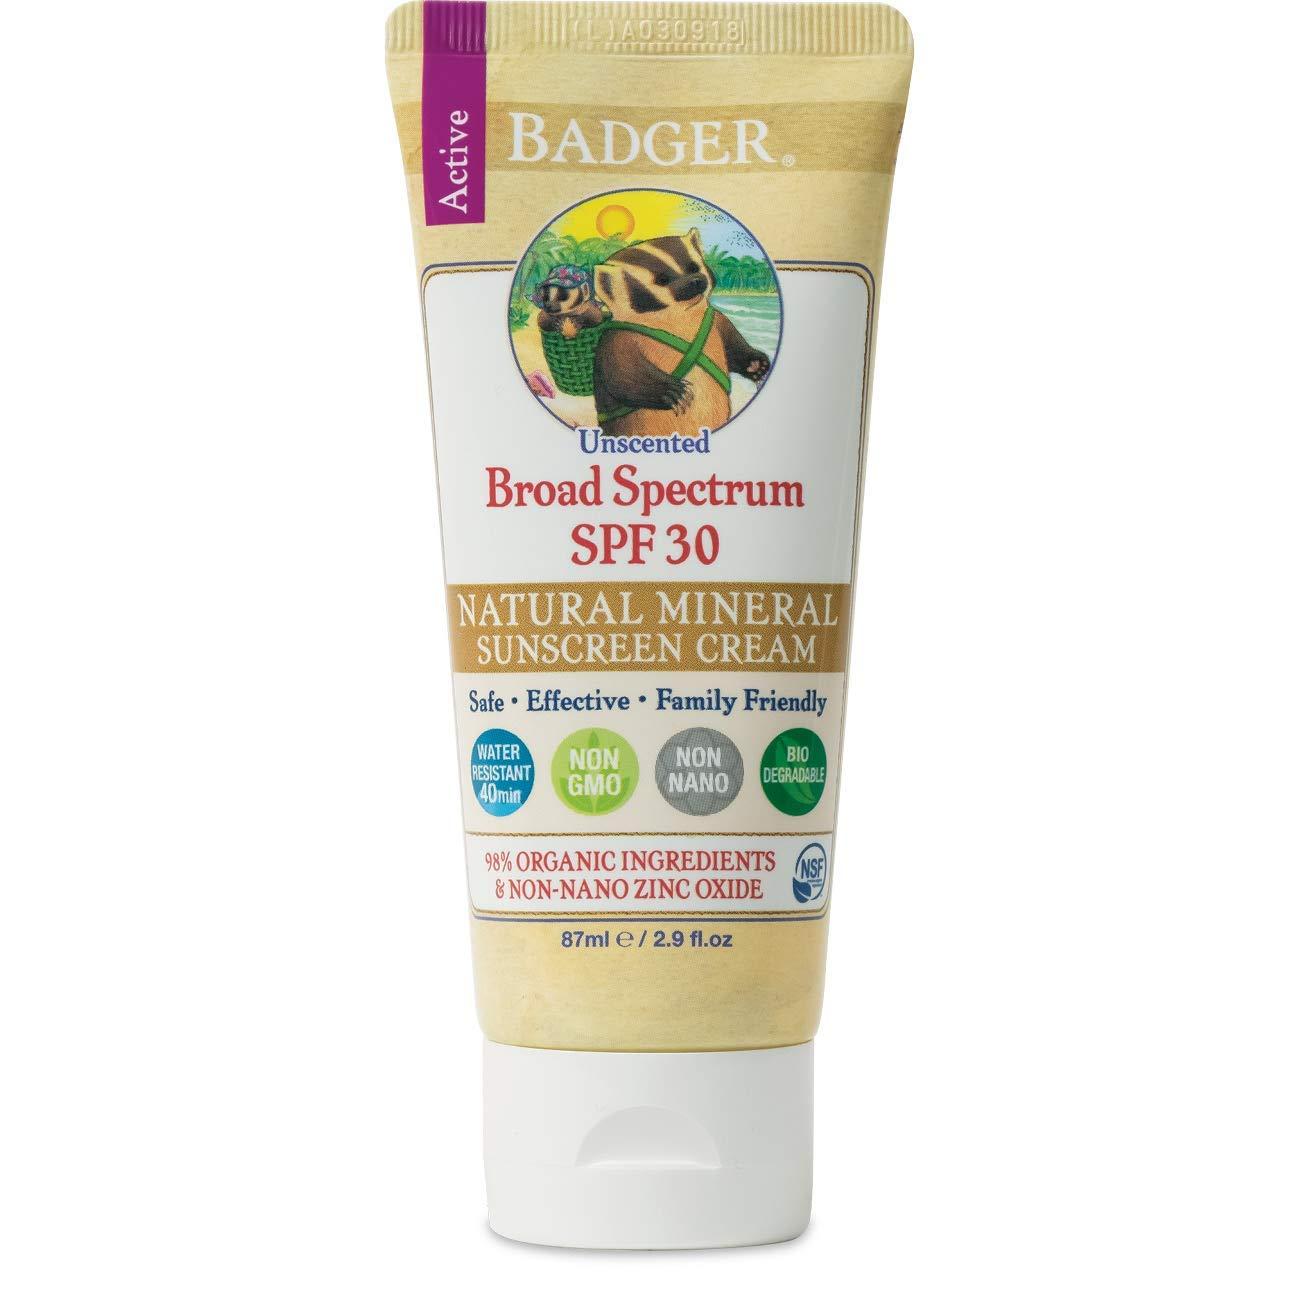 Badger - SPF 30 Zinc Oxide Sunscreen Cream - Unscented - Broad Spectrum Water Resistant Reef Safe Sunscreen, Natural…